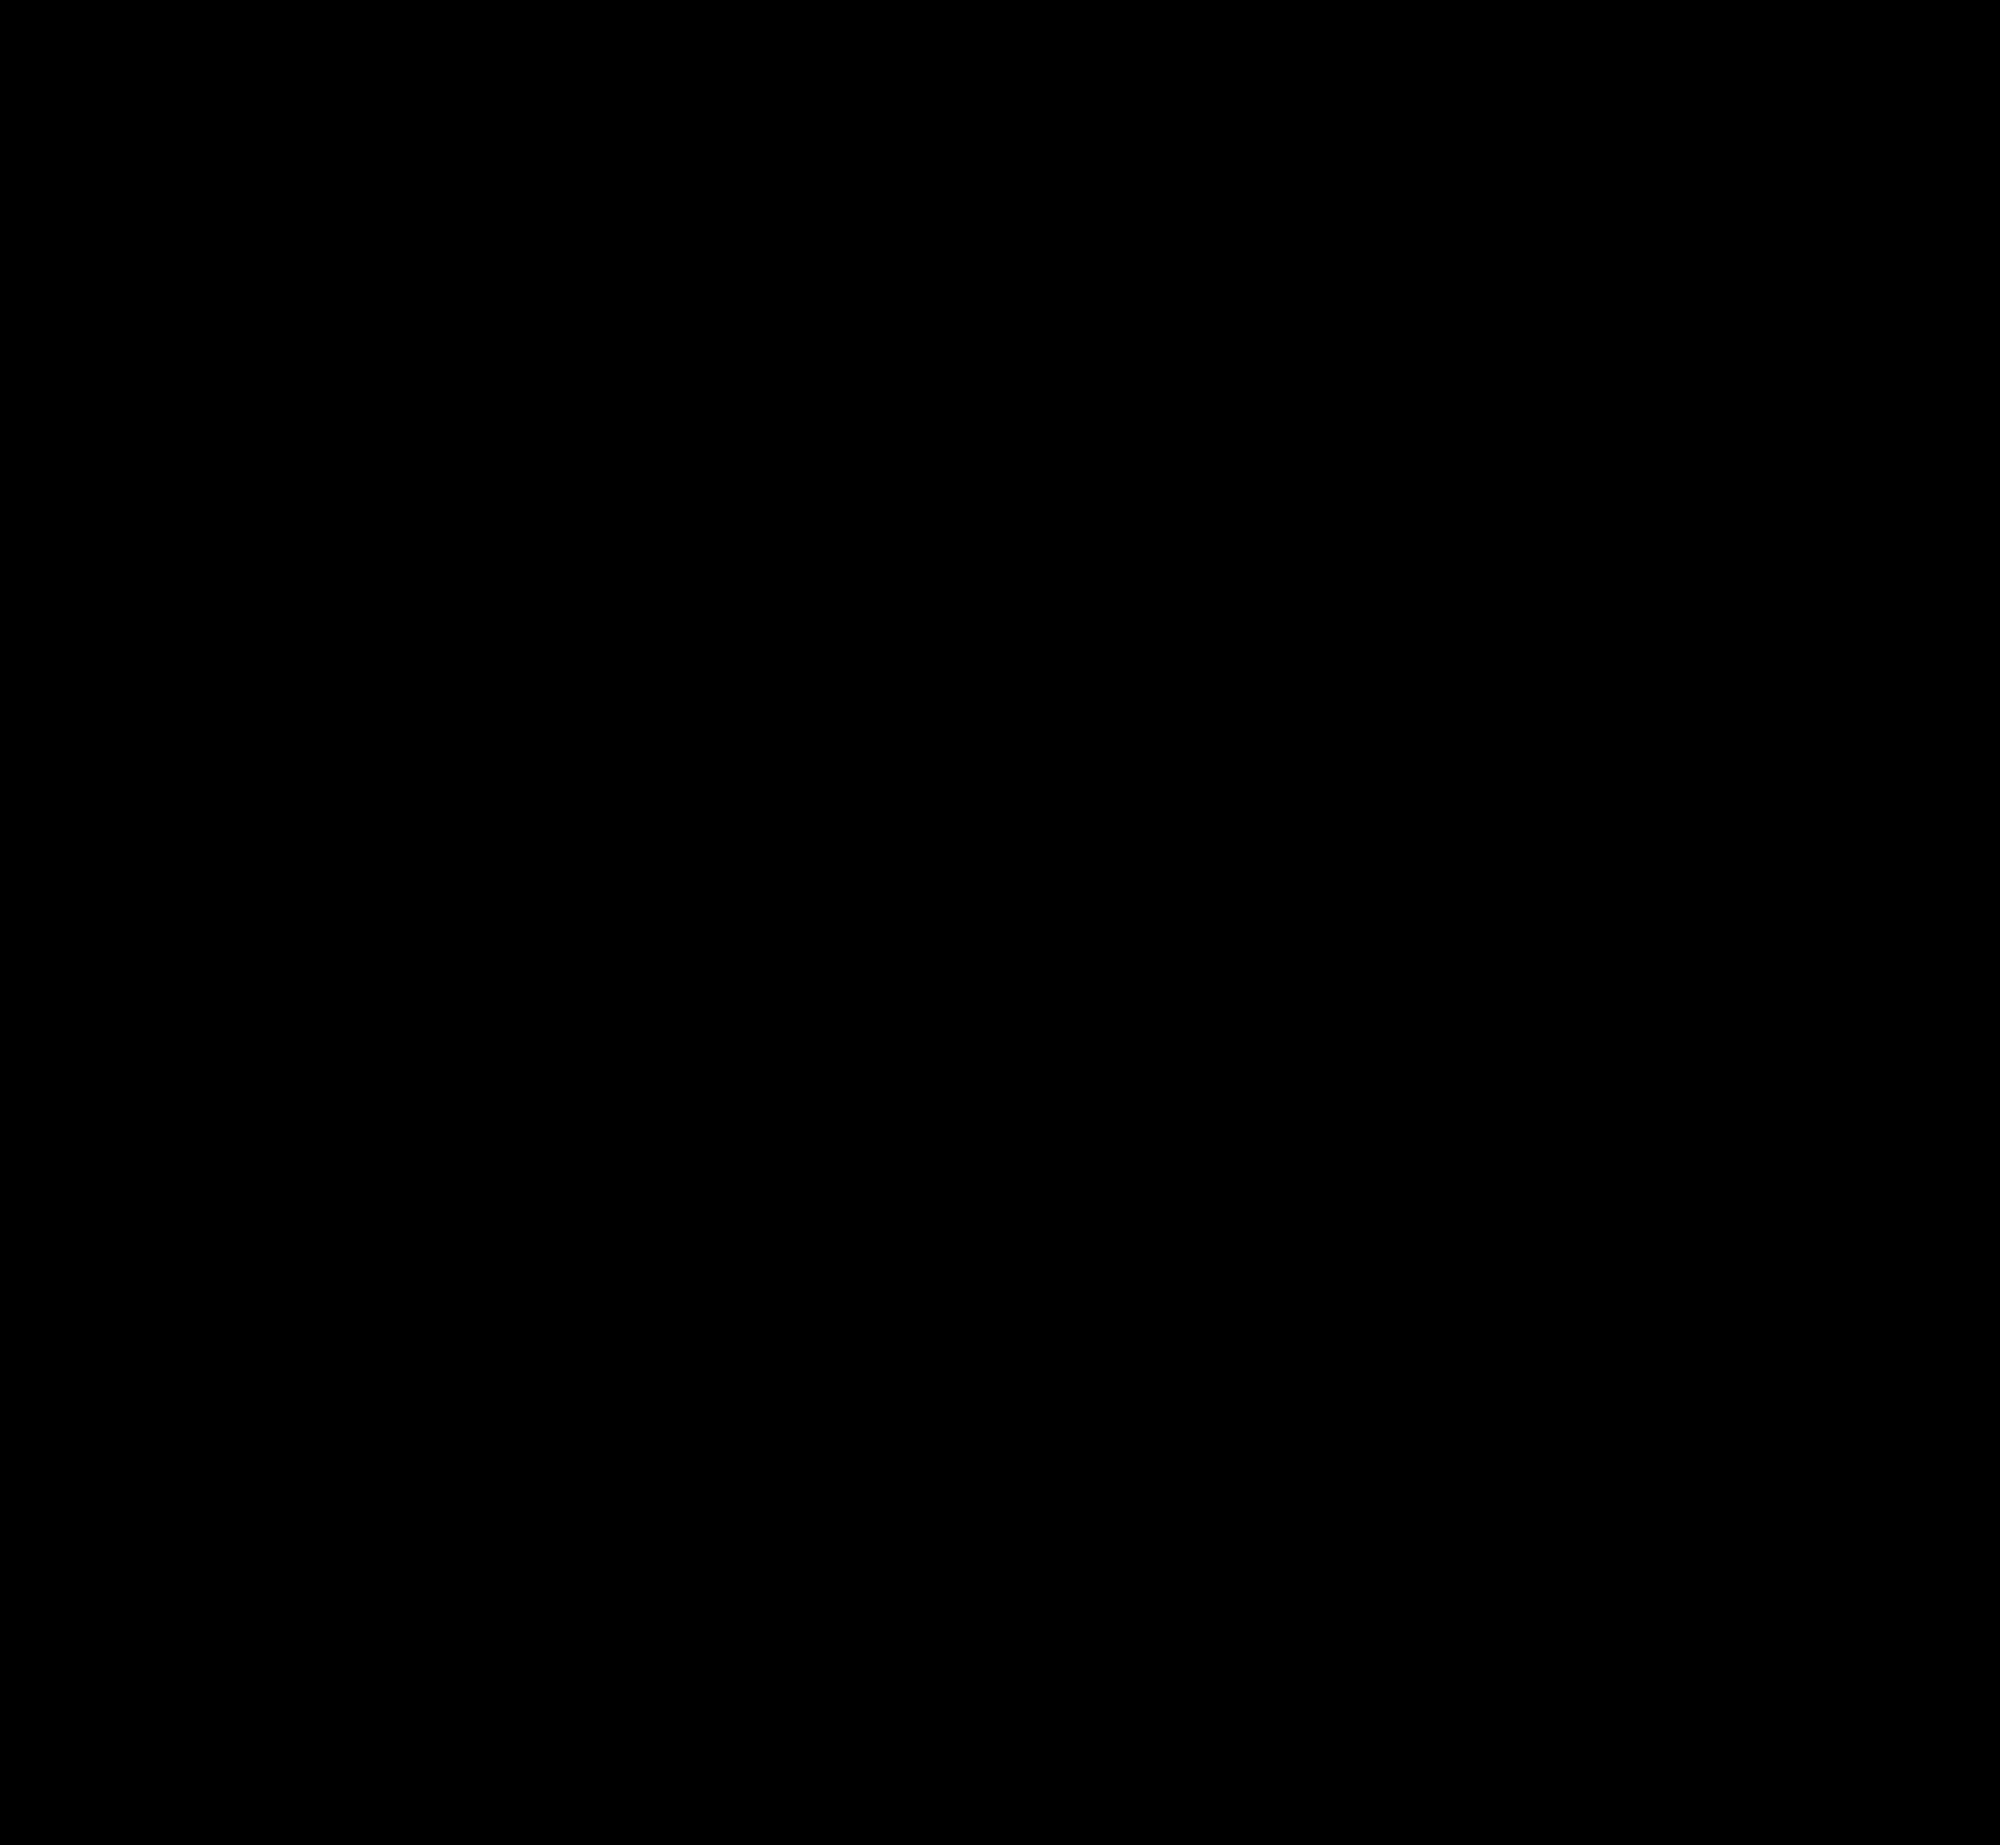 File:Toilets unisex.svg - Wikimedia Commons